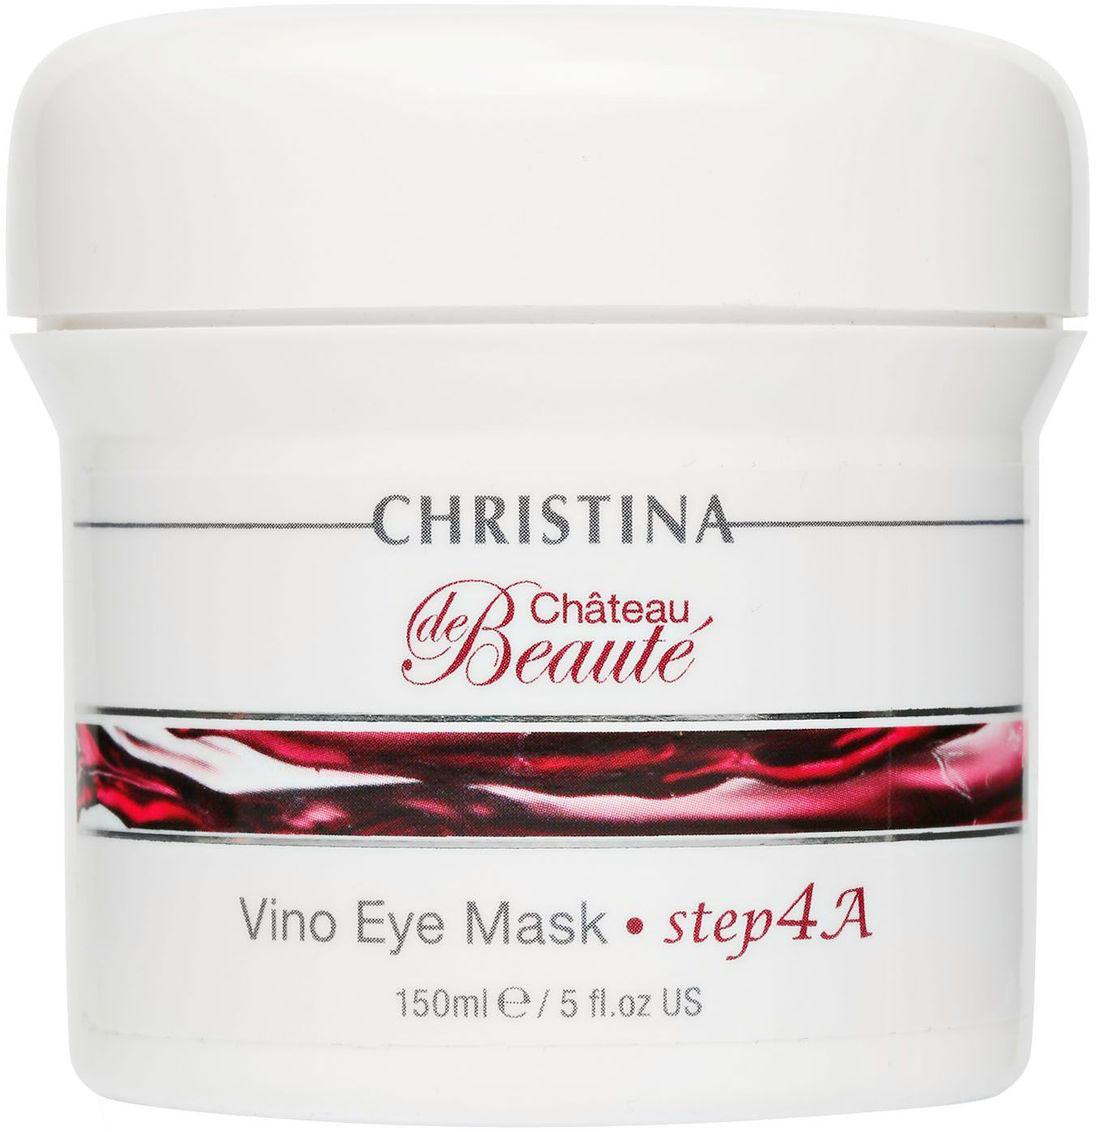 Christina Chateau De Beaute Vino Eye Mask - Маска для кожи вокруг глаз (шаг 4a) 150 мл picard 4206 1g0 909 vino